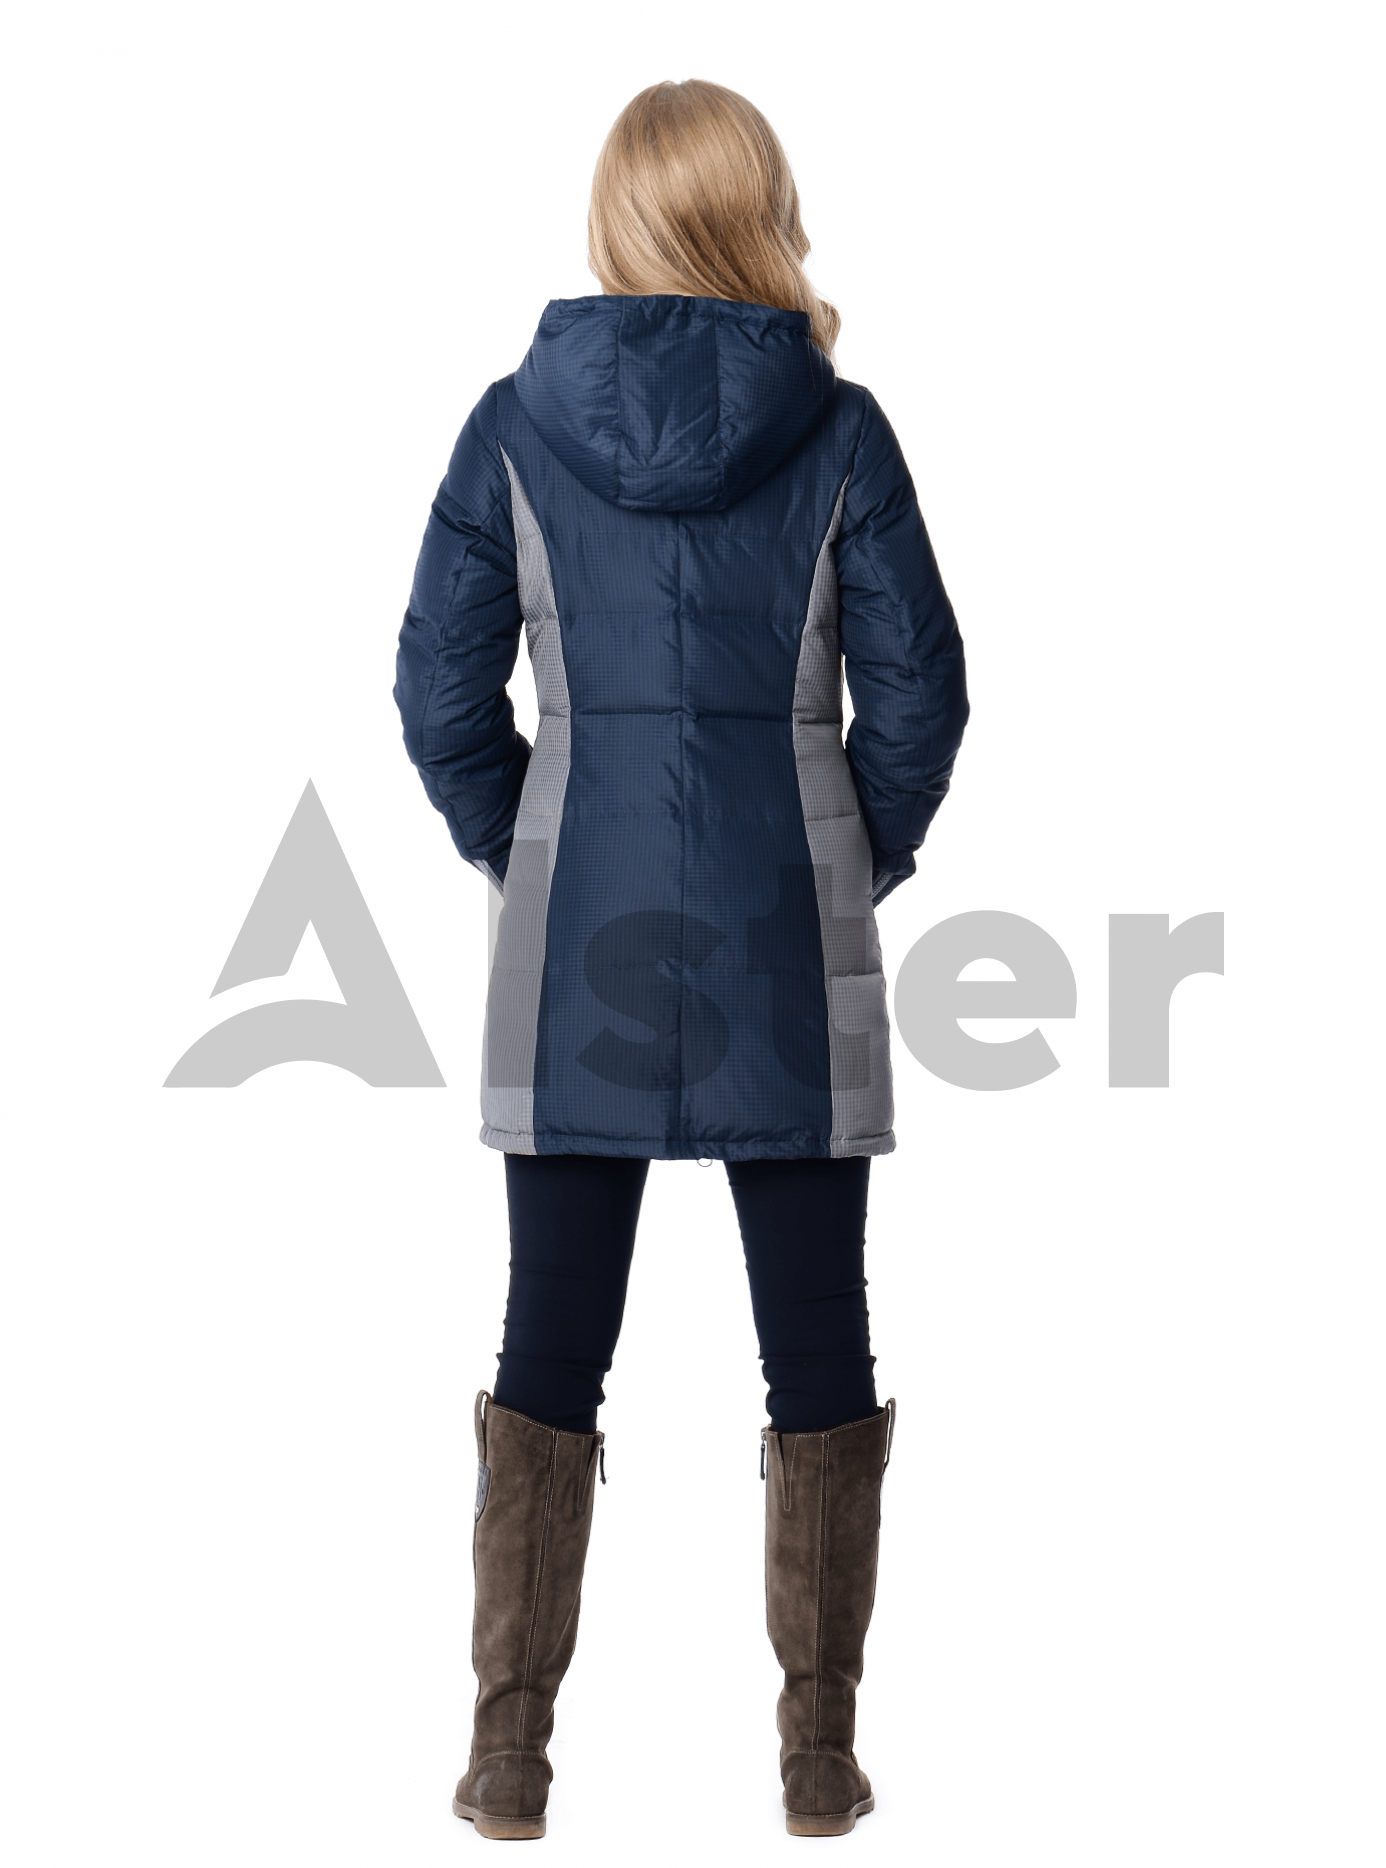 Куртка зимняя средней длины Тёмно-синий S (04-CC19092): фото - Alster.ua